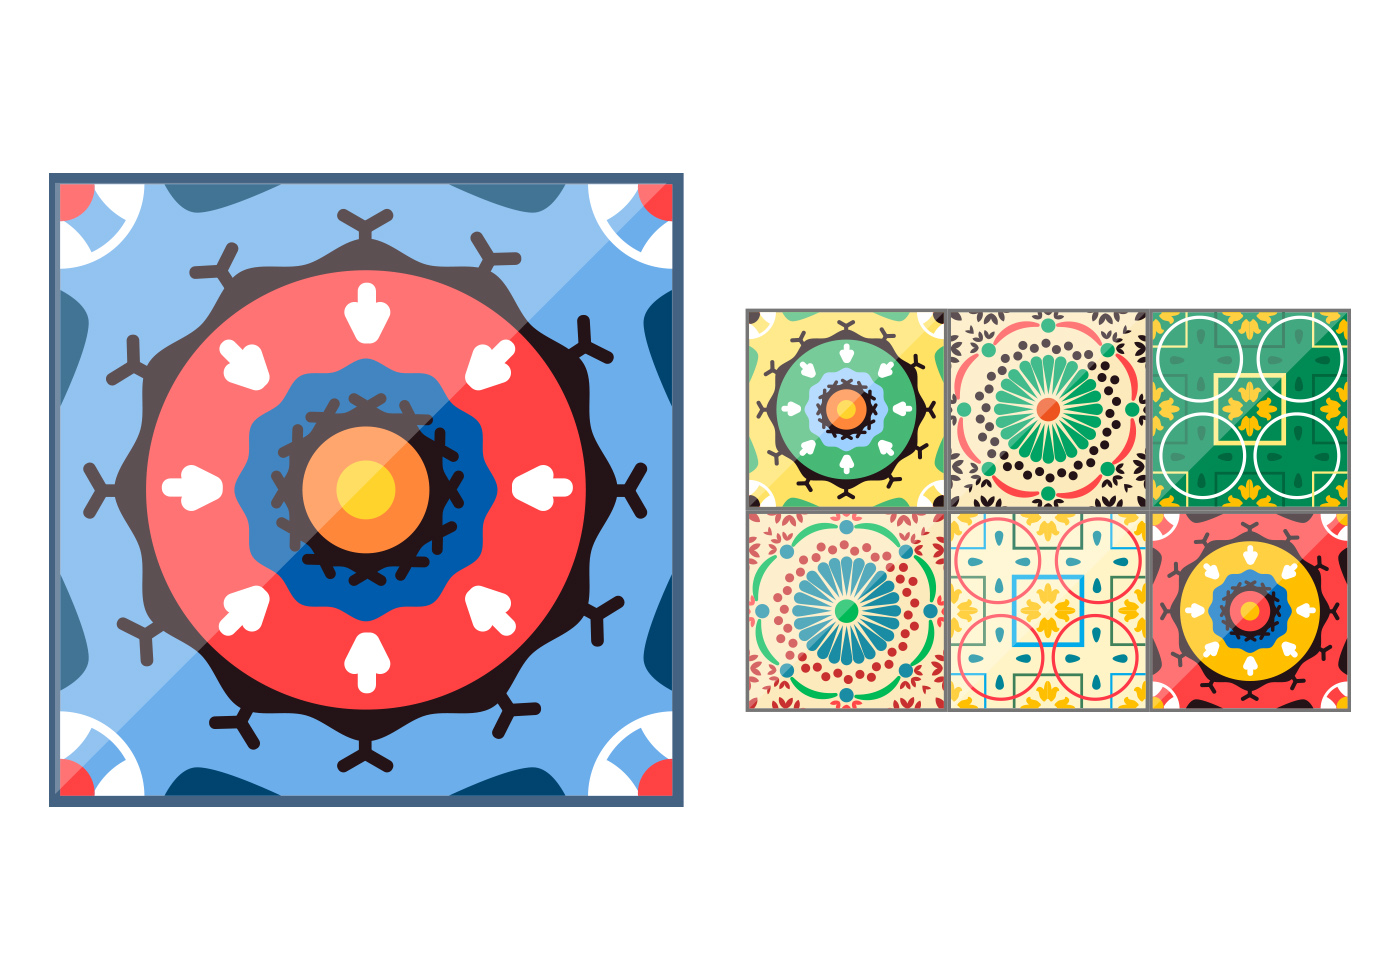 Spanish Ceramic Tile Vectors Download Free Vector Art Stock